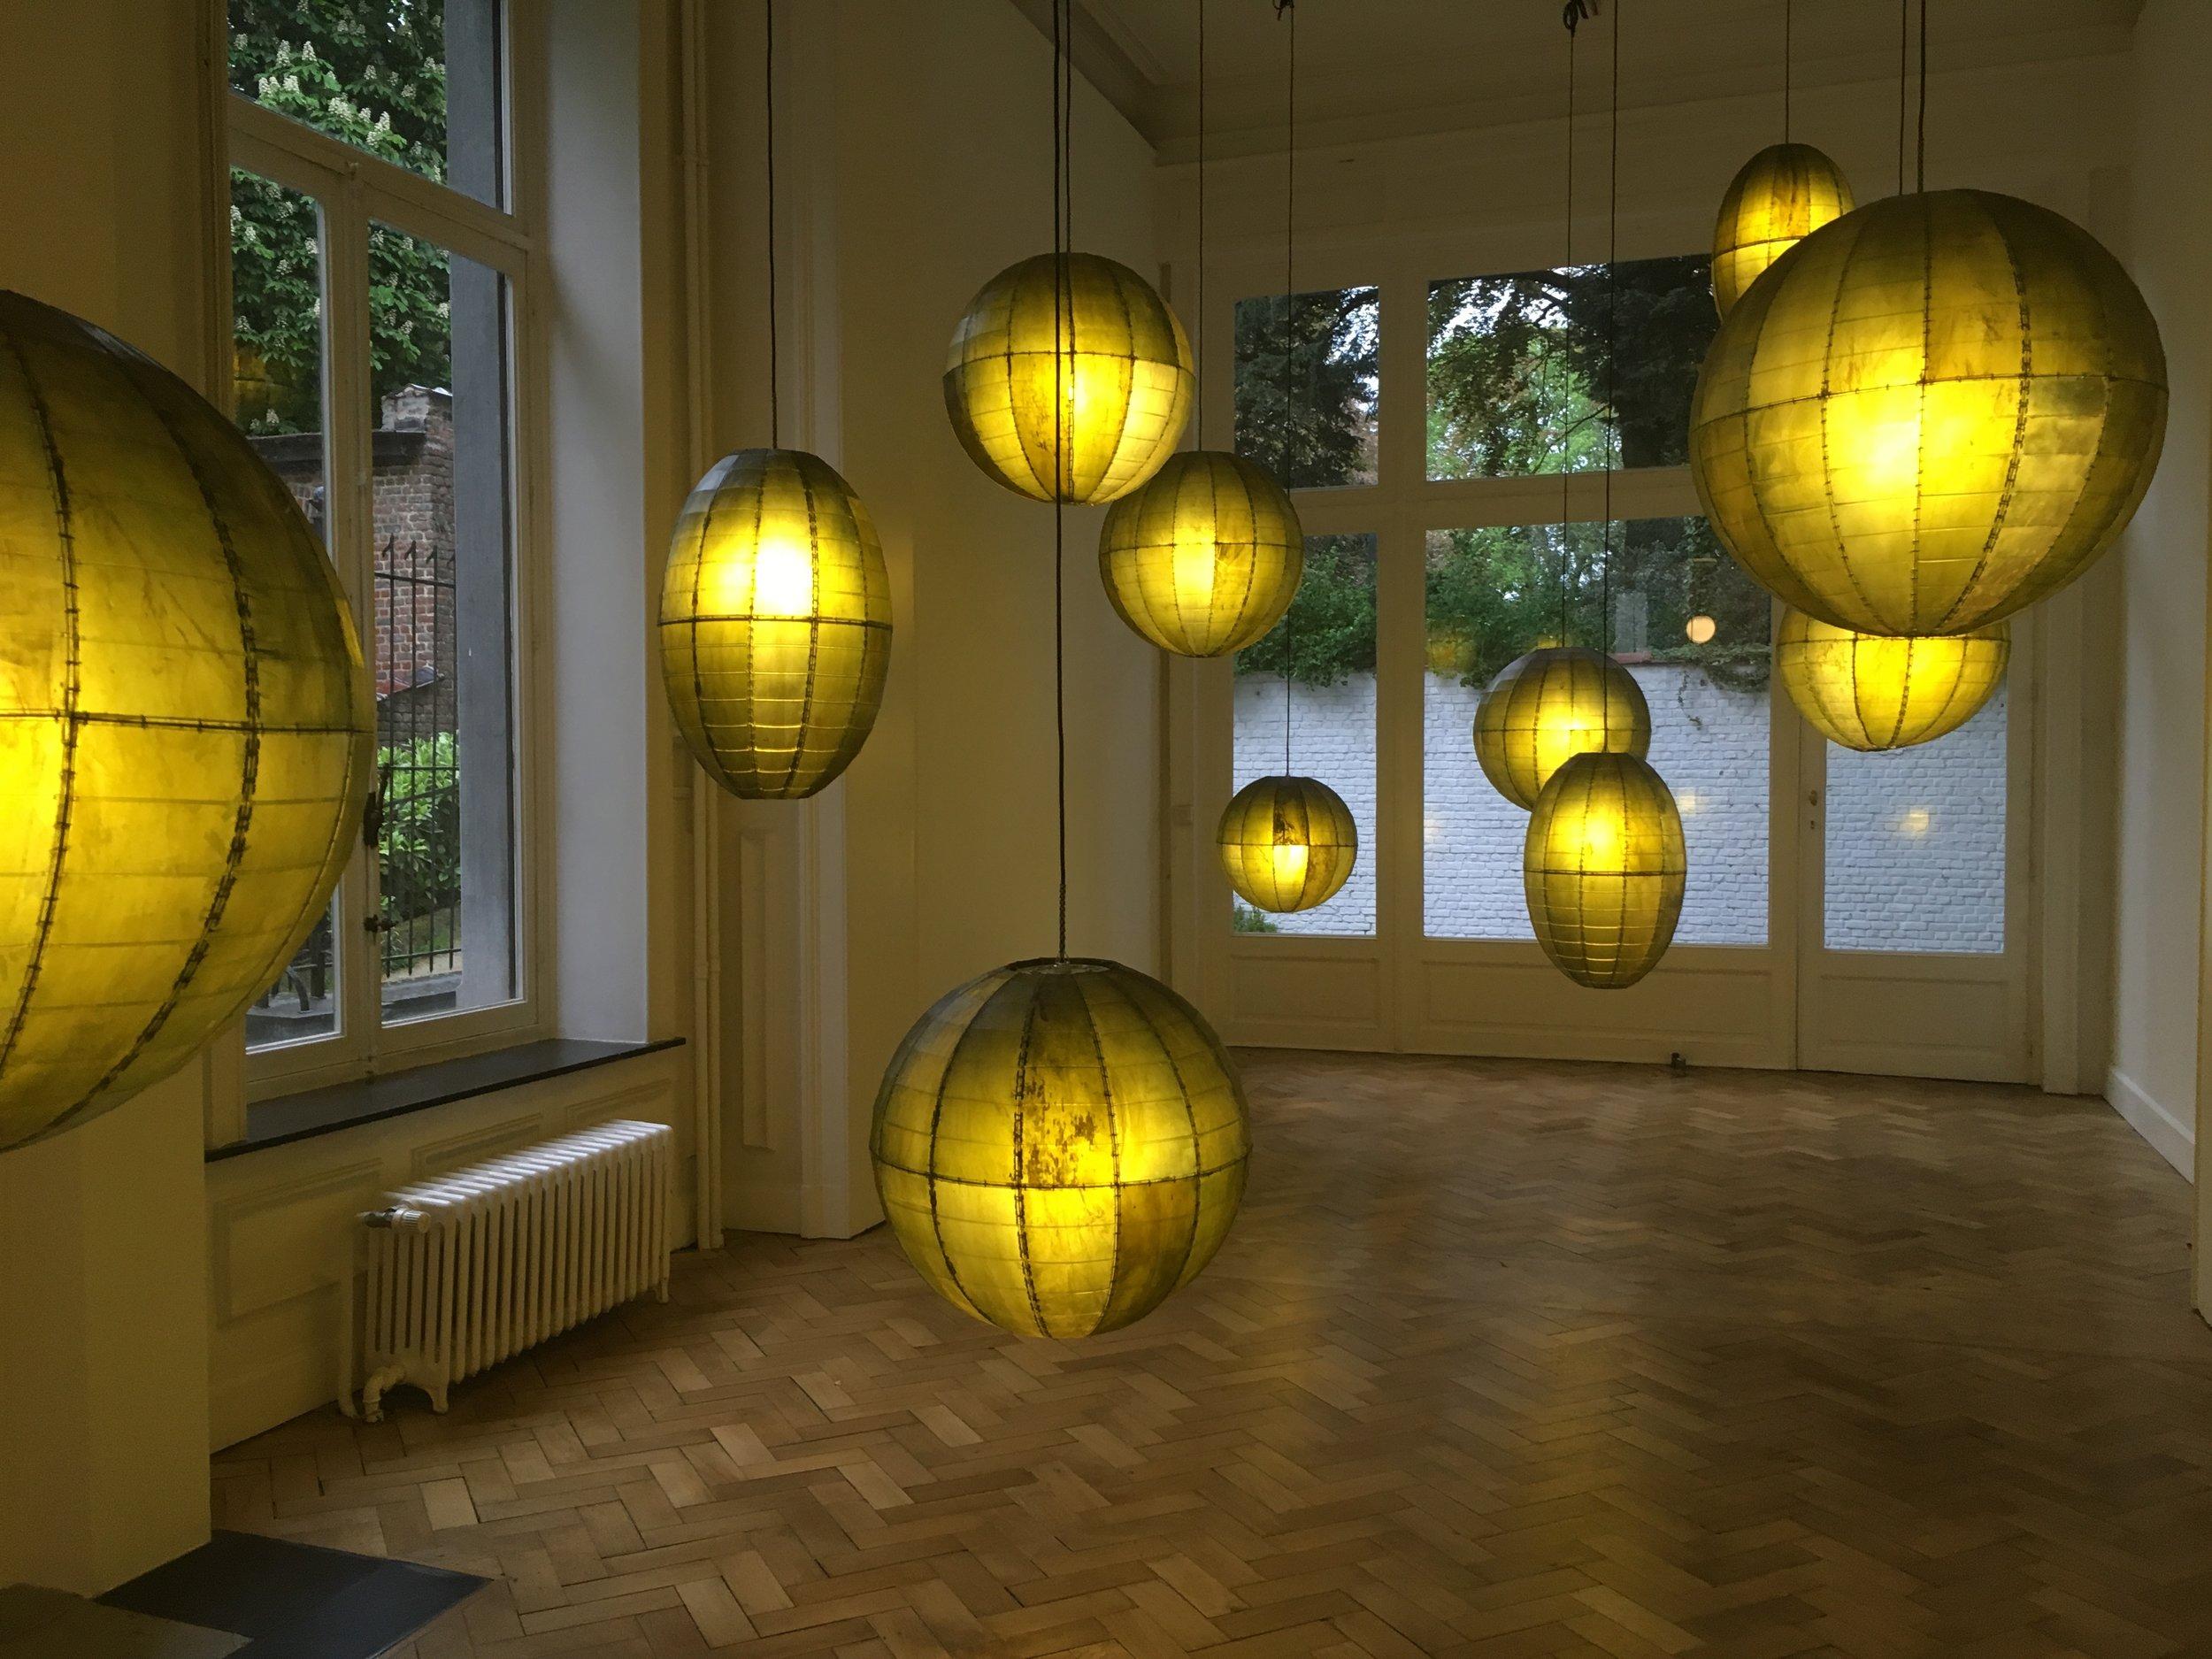 Anicka Yi / Gladstone Gallery